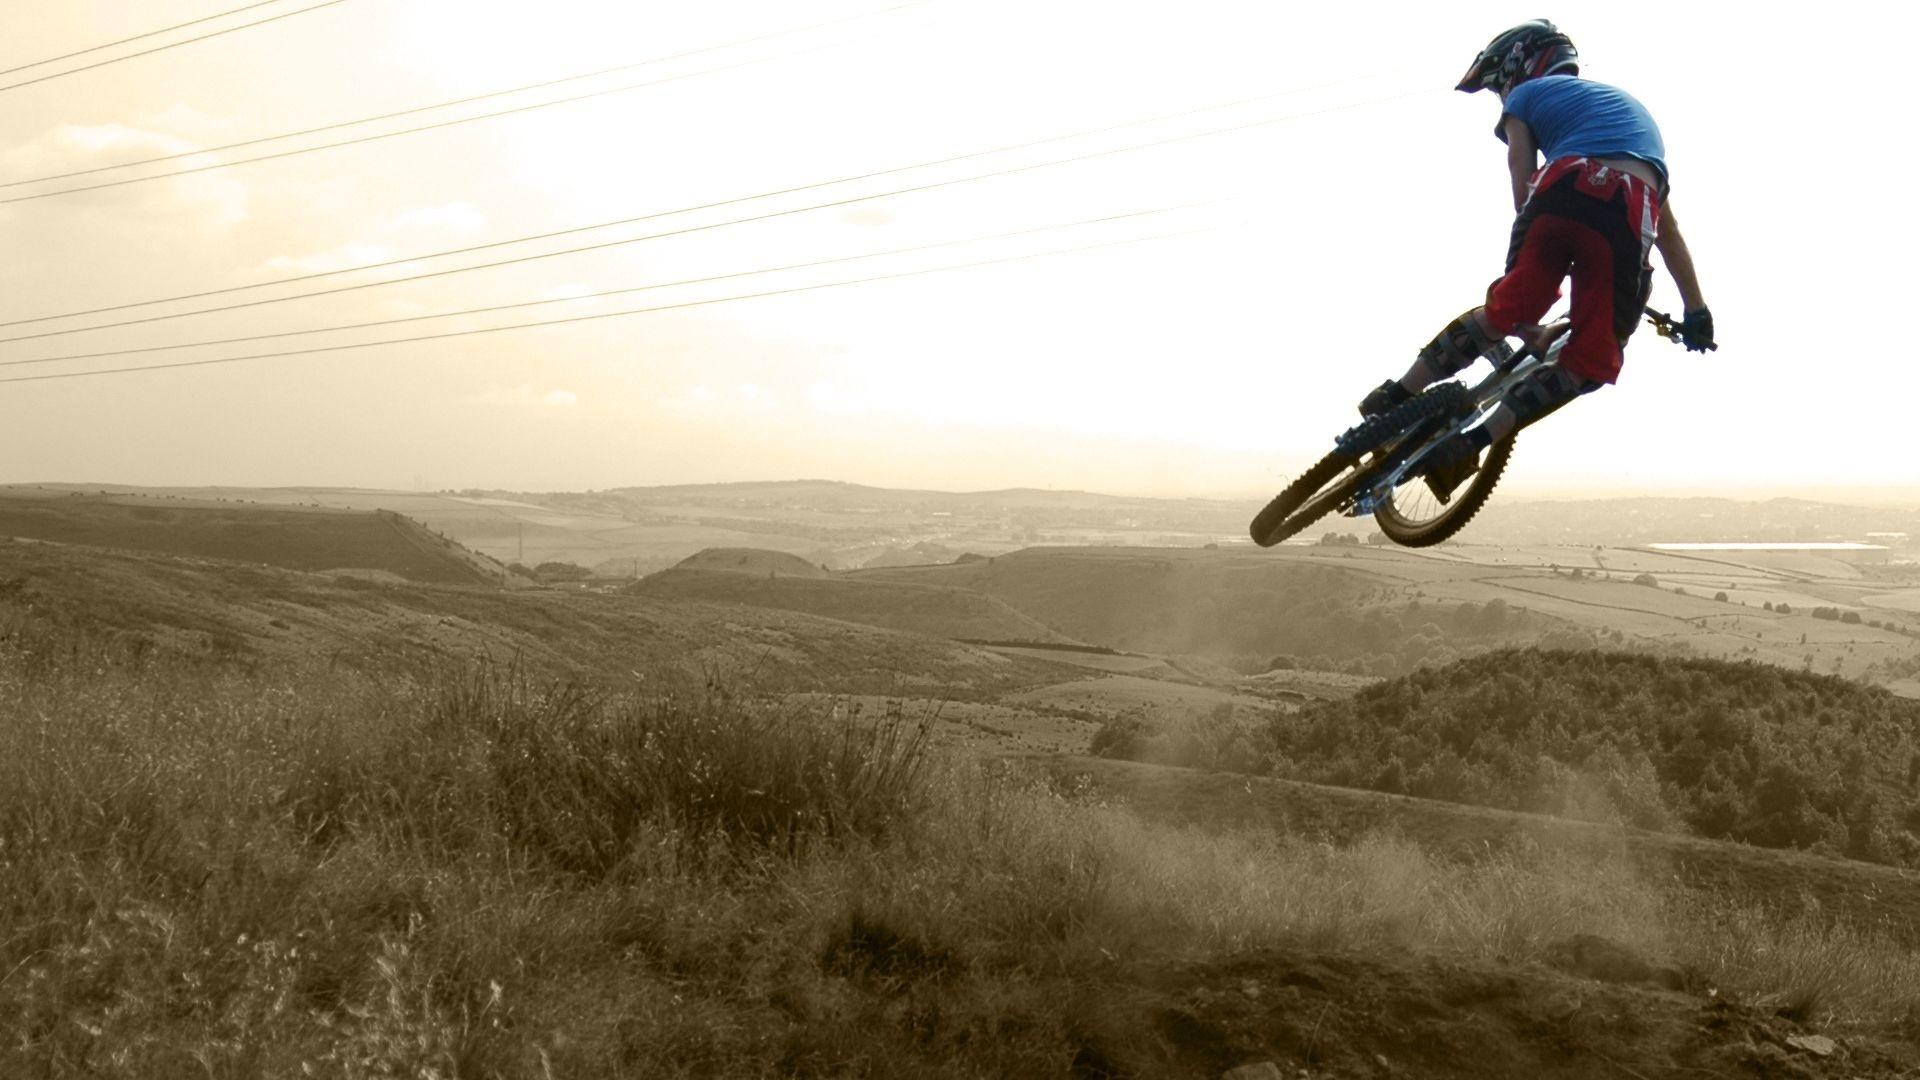 Downhill Mountain Bike Wallpaper 67 Images